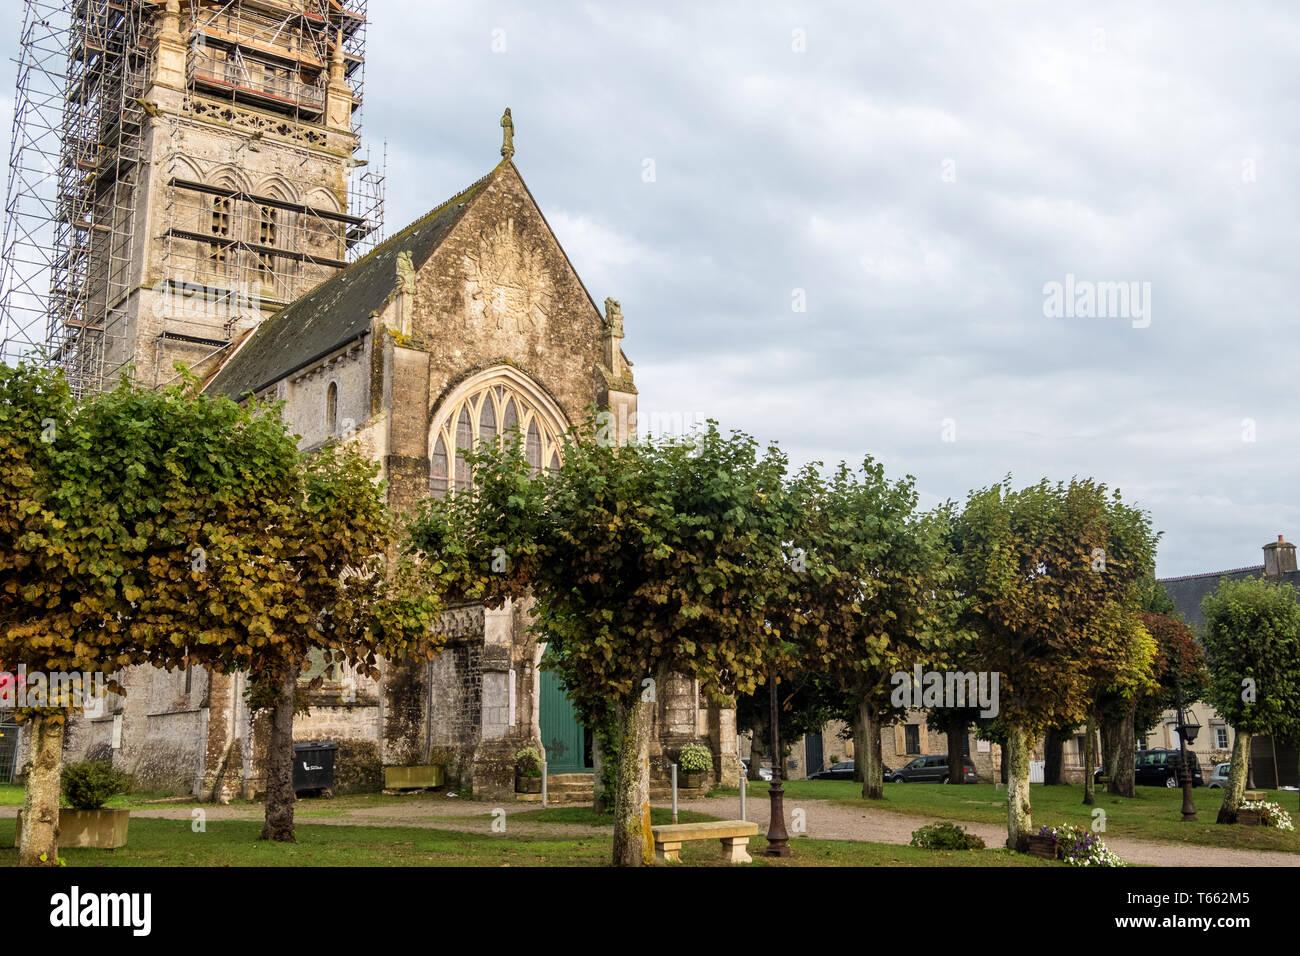 Sainte-Marie-du-Mont, France - August 16, 2018: The church of Notre-Dame of the Assumption in Sainte-Marie-du-Mont. Normandy, France Stock Photo